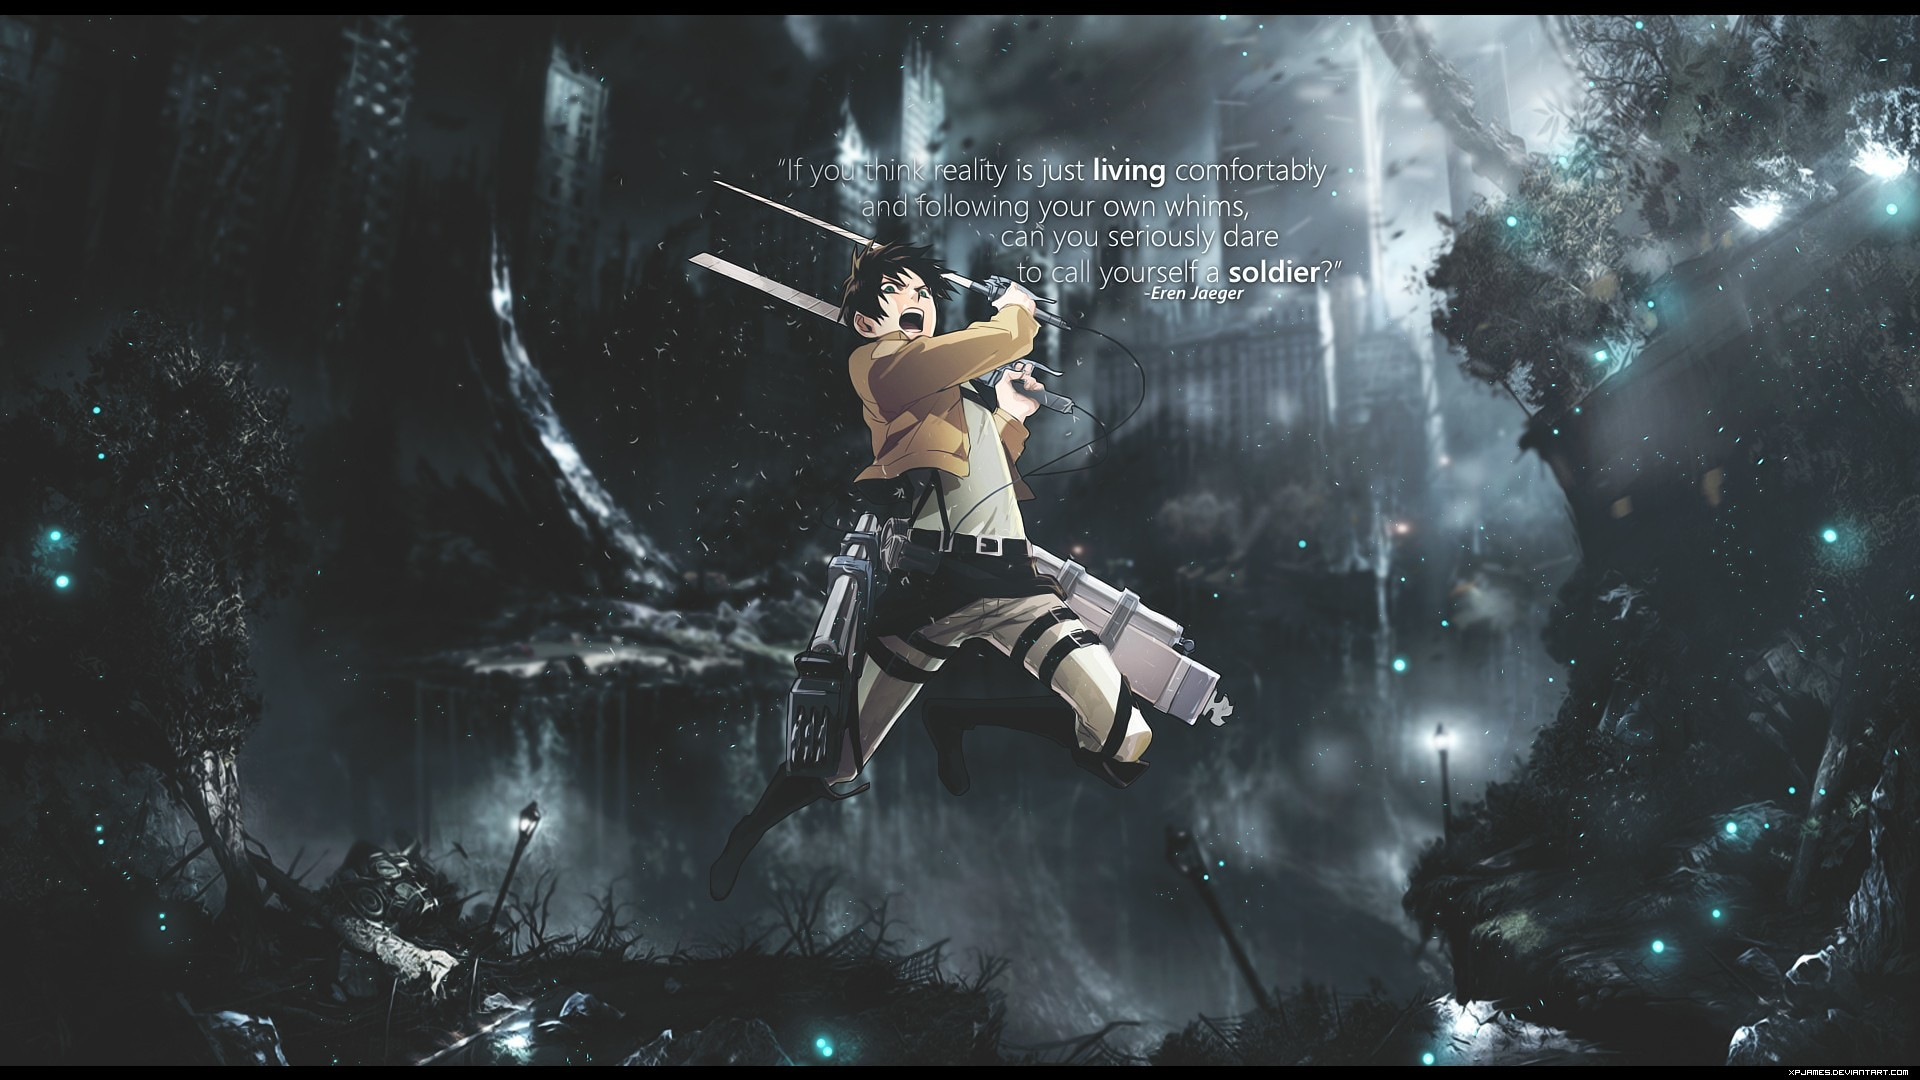 Shingeki No Kyojin Eren Jaeger 14 Background Wallpaper. Shingeki No Kyojin  Eren Jaeger 14 Background Wallpaper